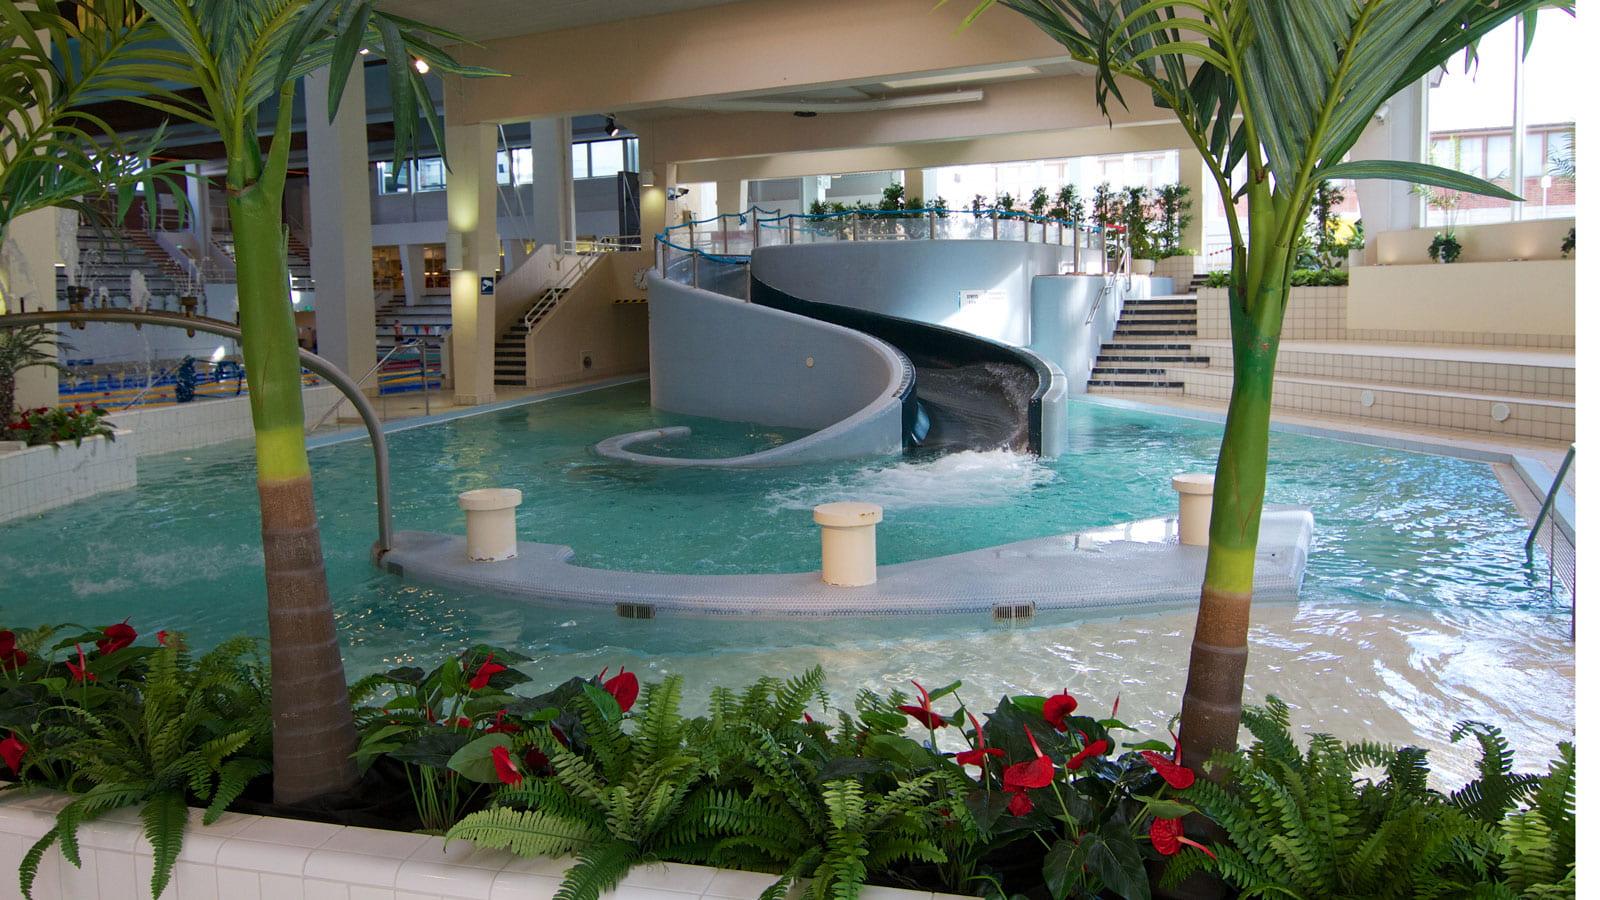 AaltoAlvari's swimming pool and water slide.